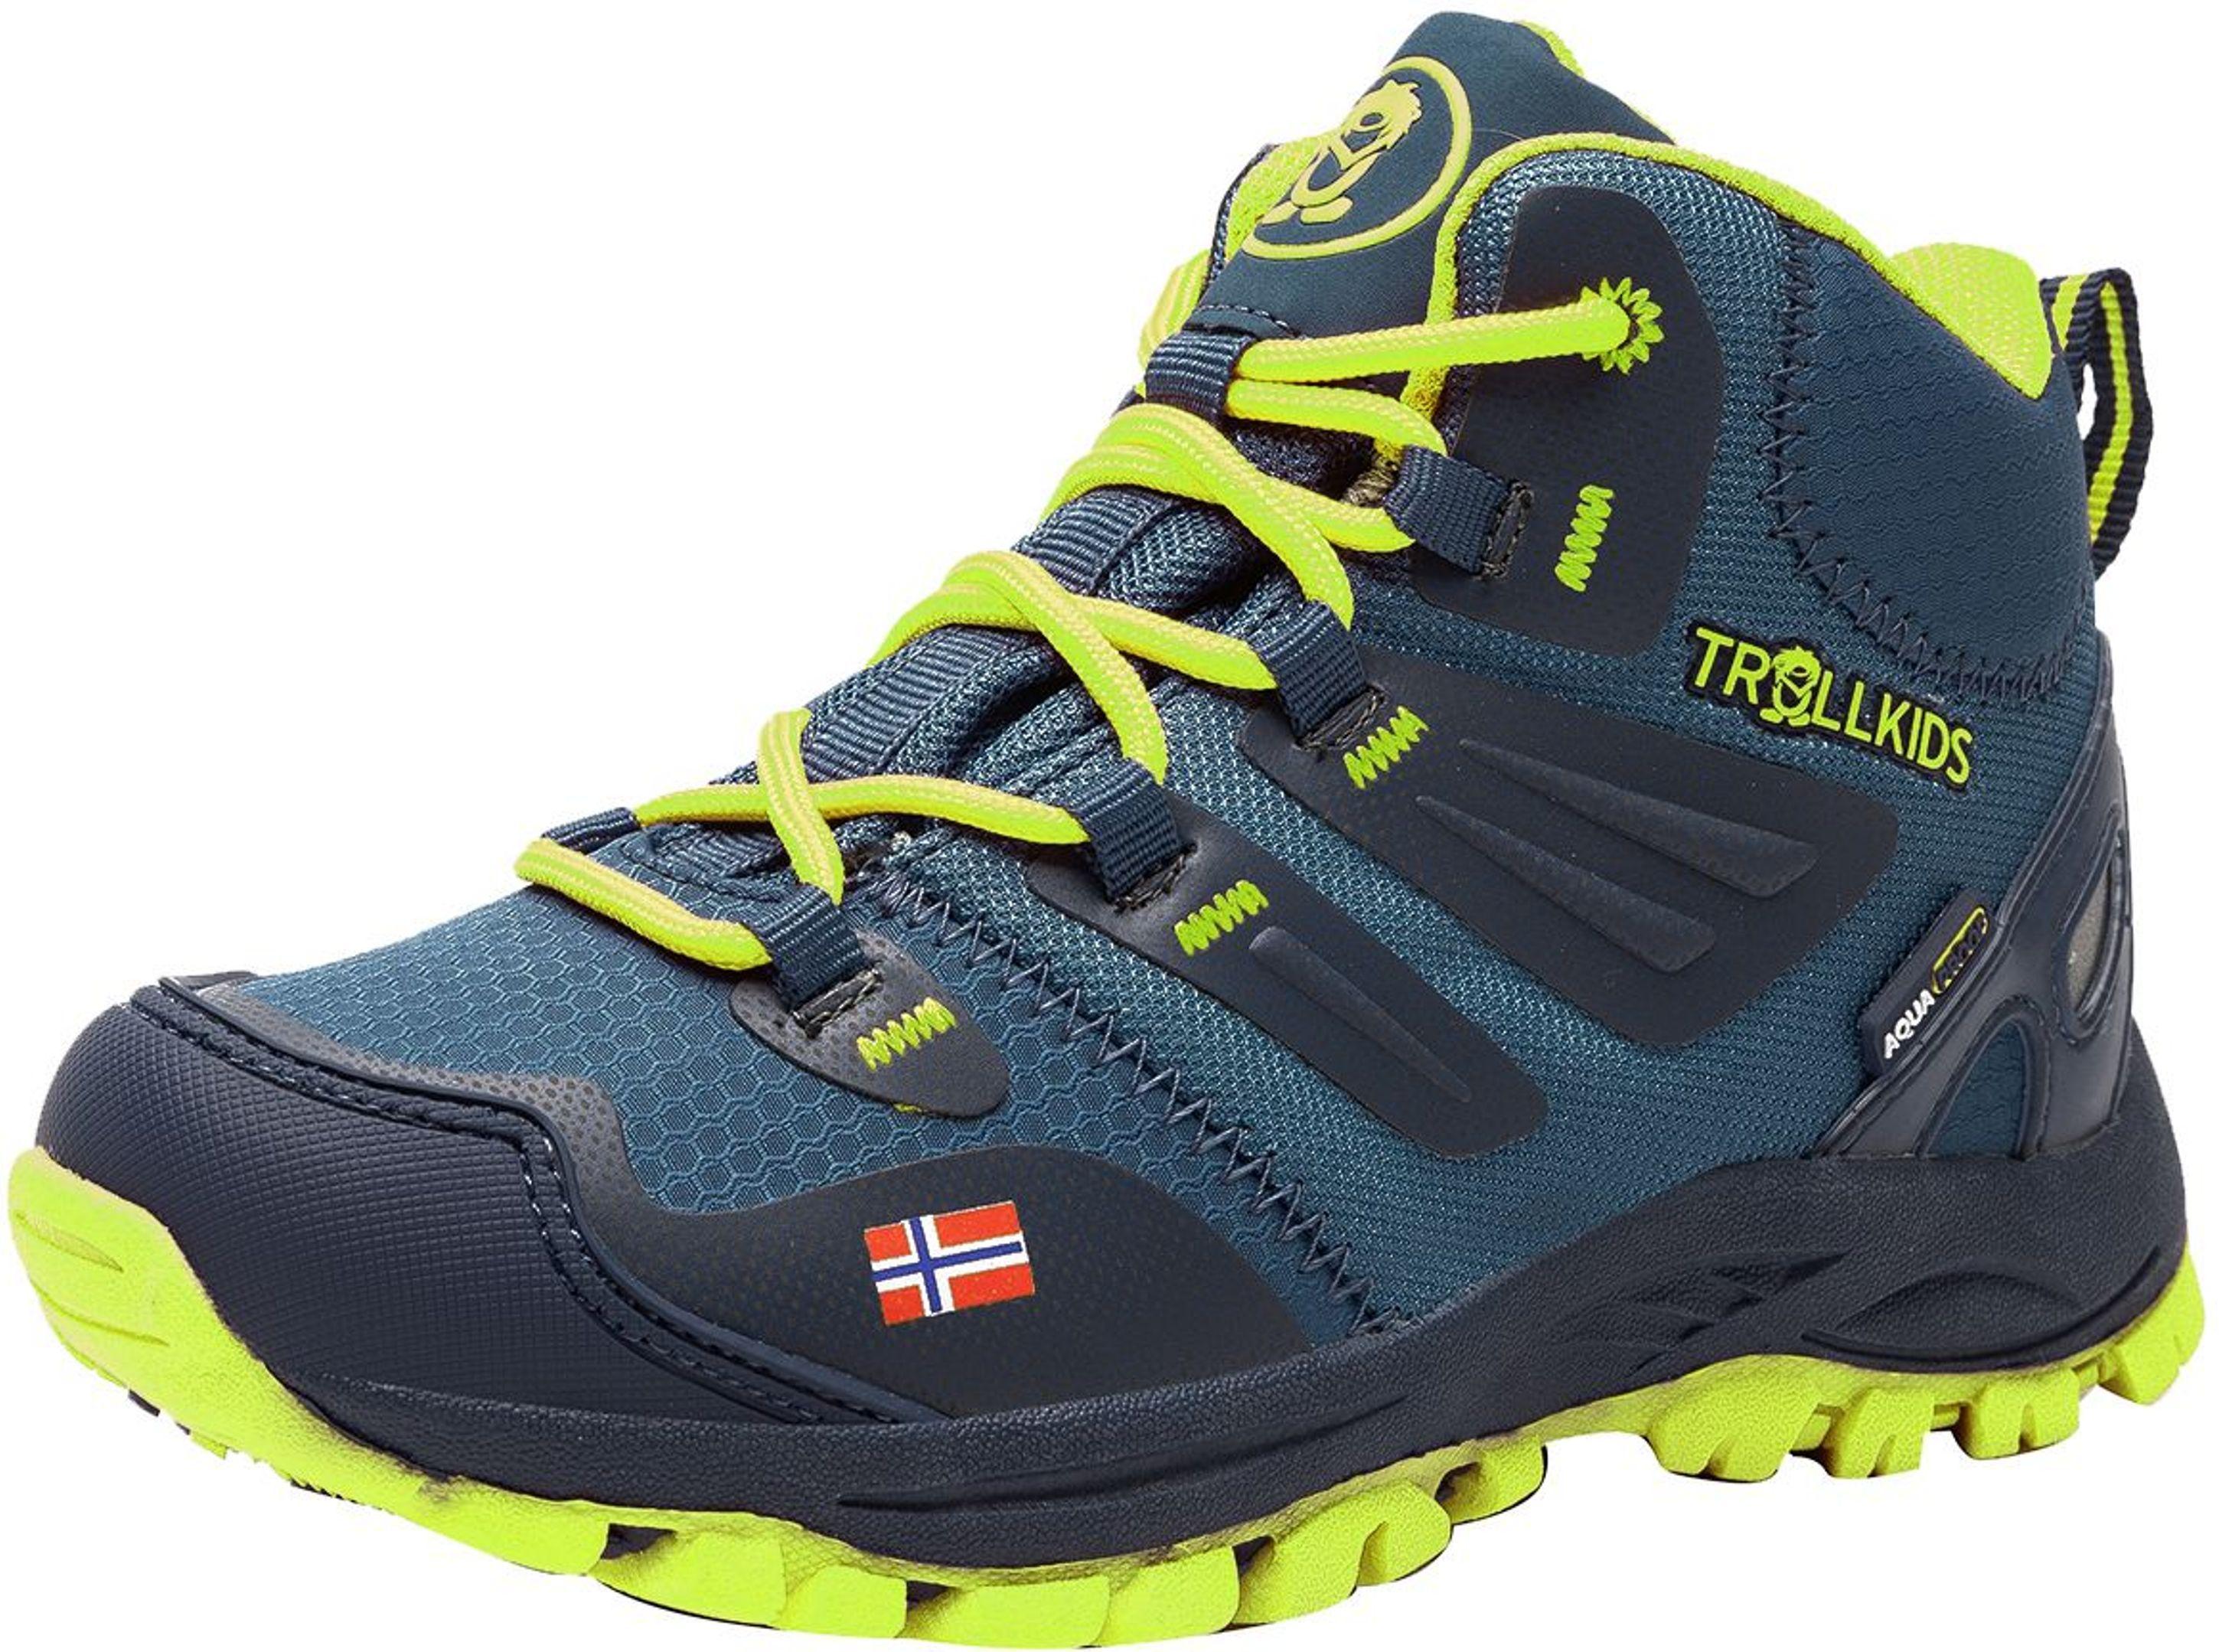 Trollkids Rondane Hiker Mid Navy/Lime